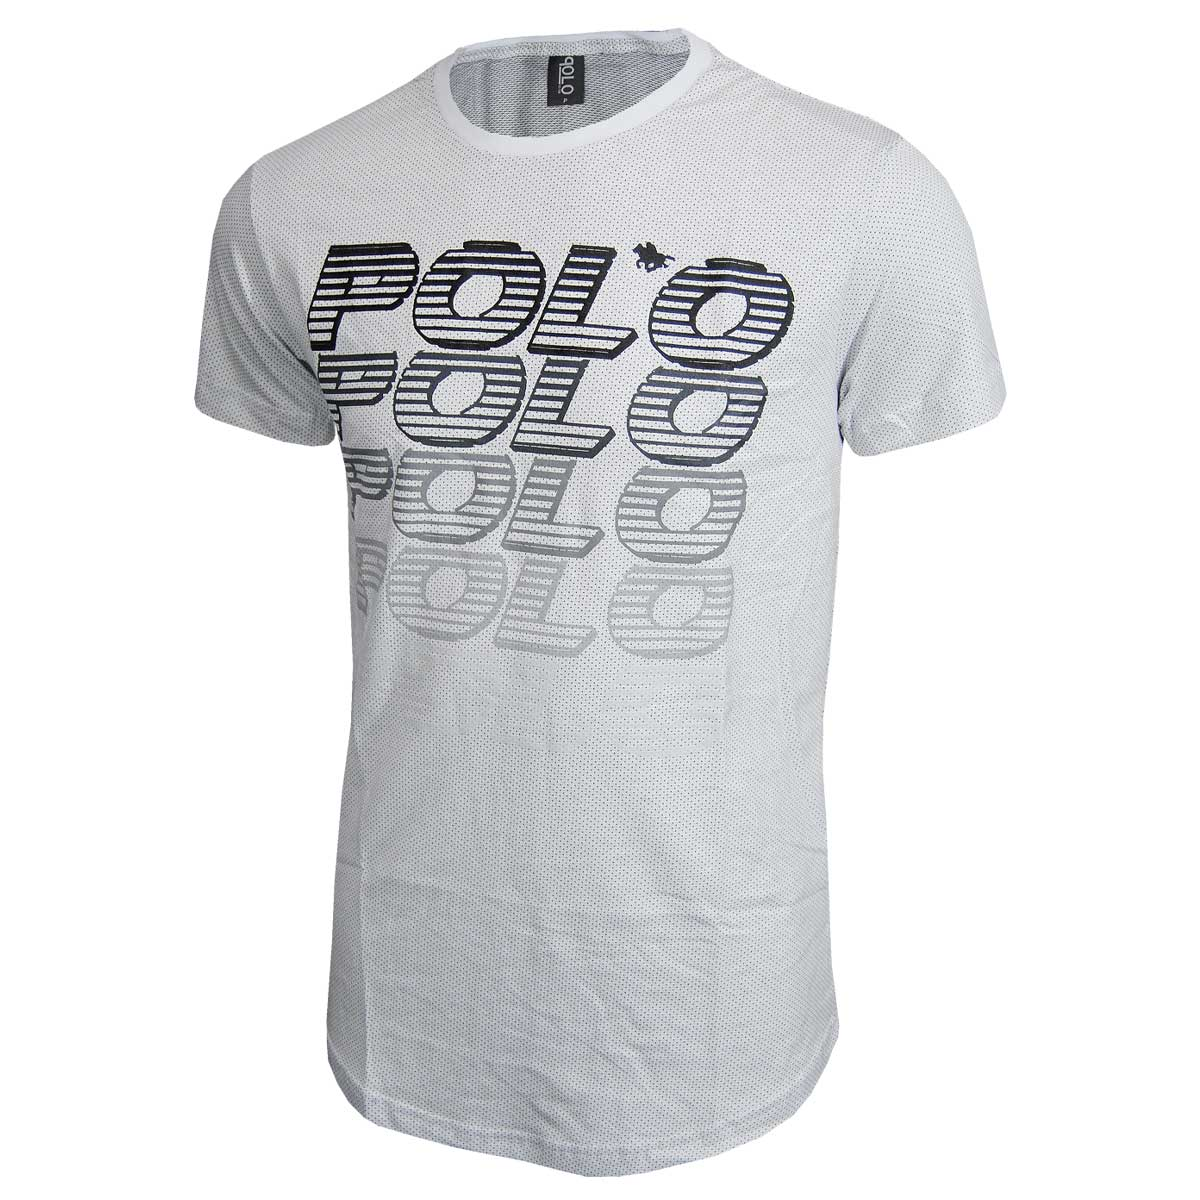 Camiseta Swag Long Line  Polo Rg518